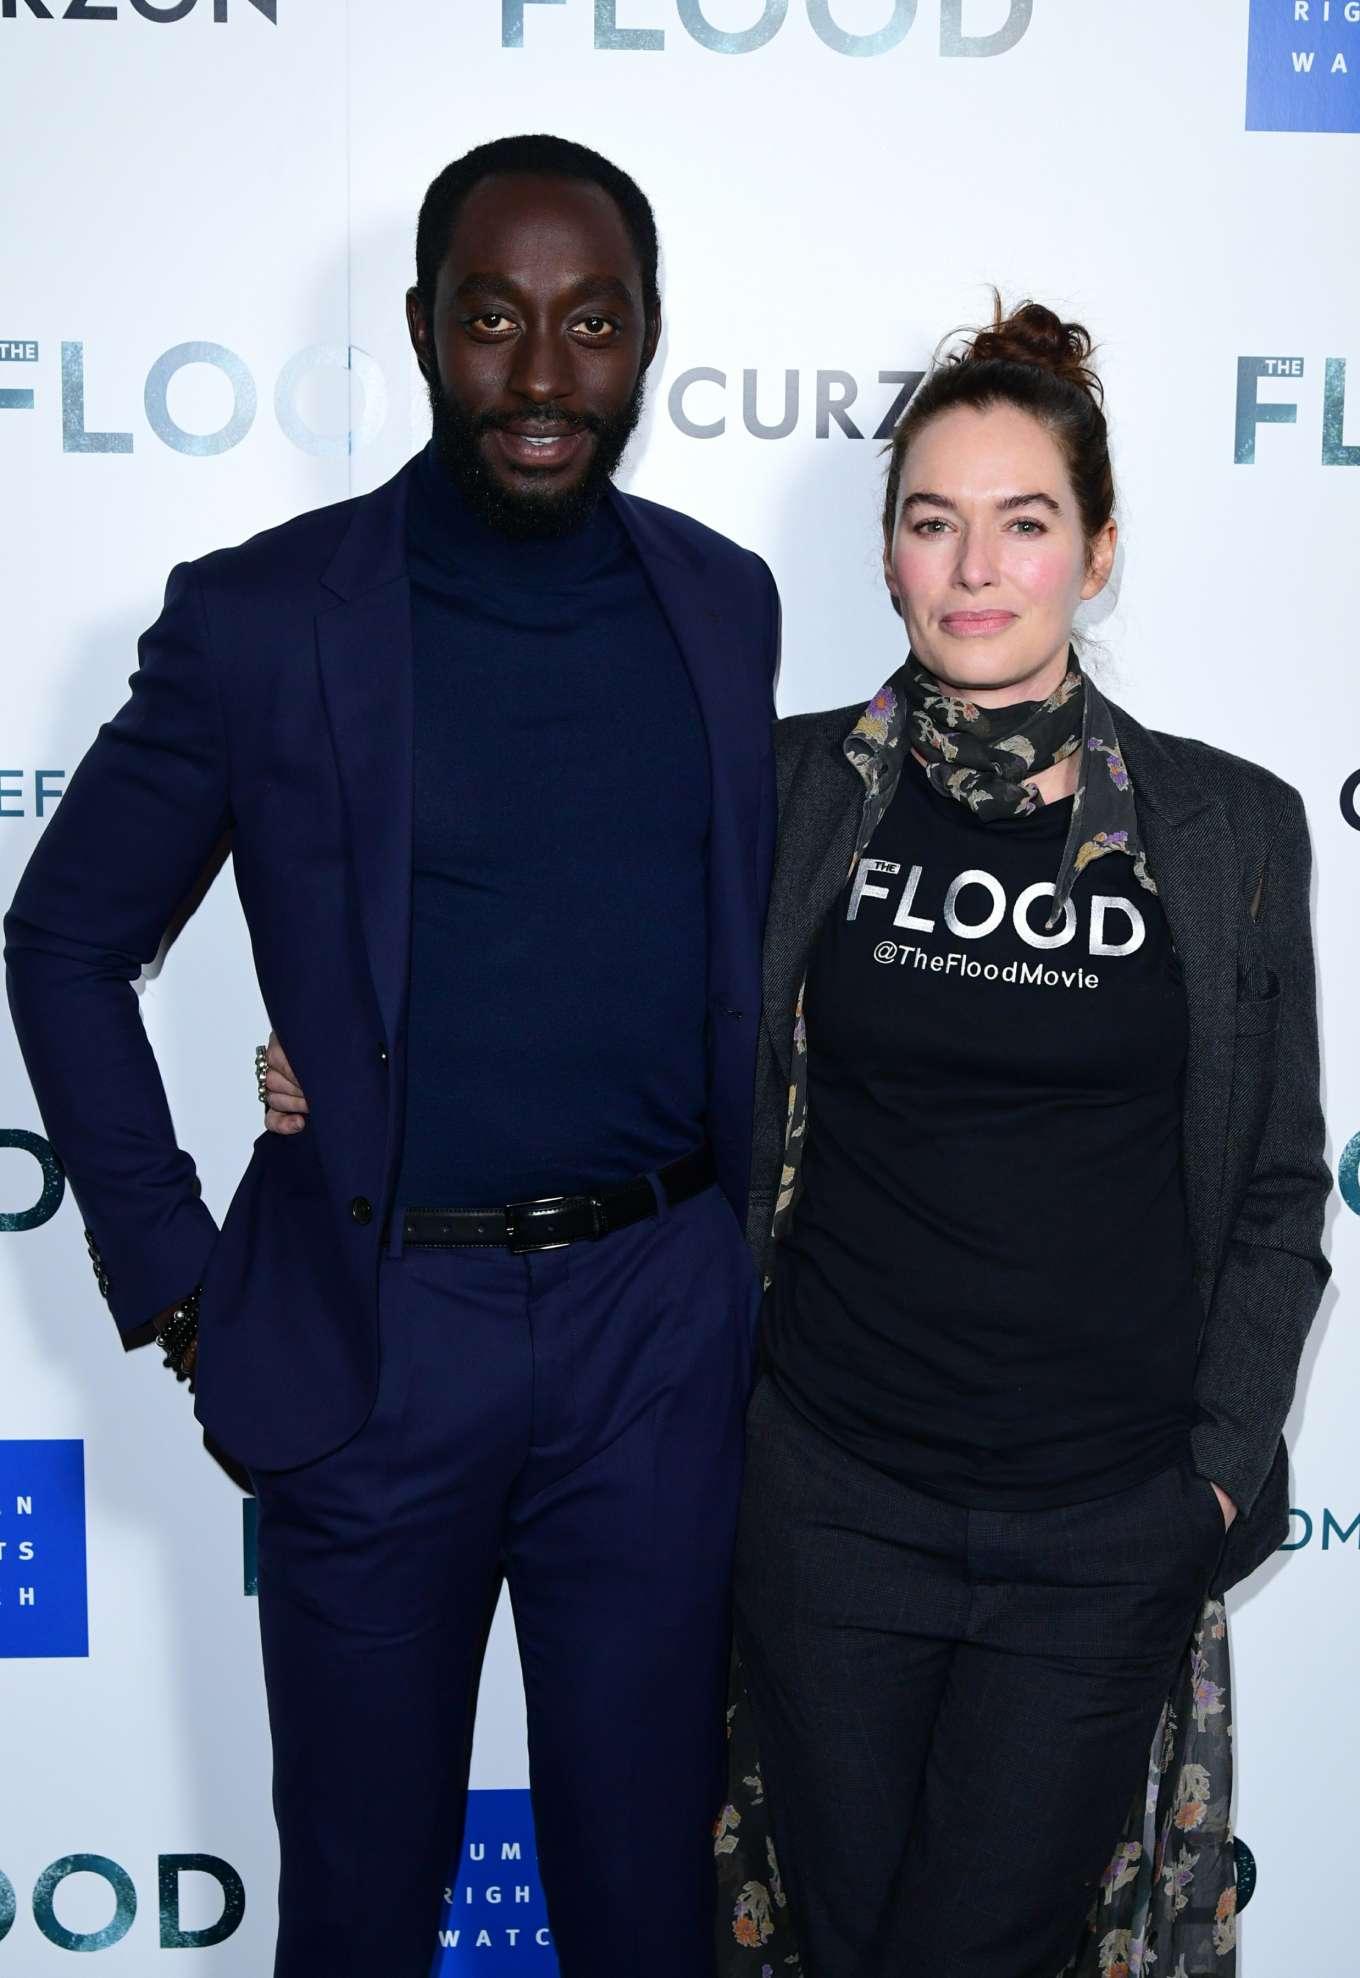 Lena Headey 2019 : Lena Headey: The Flood Screening in London-14